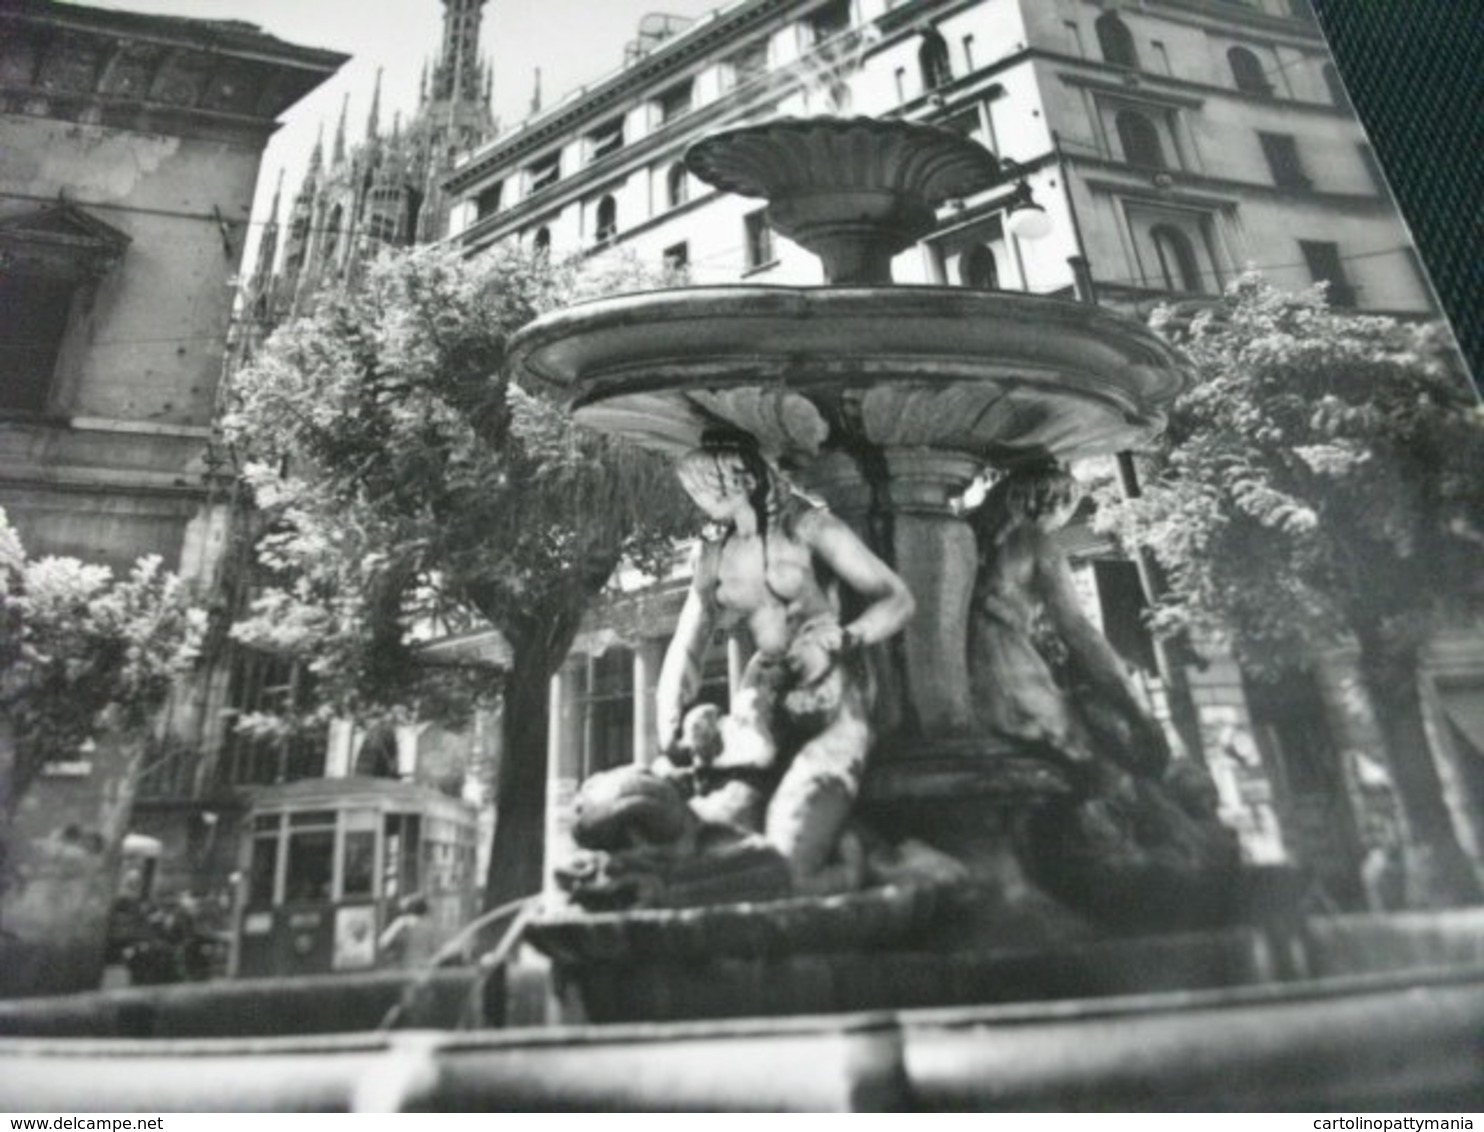 Conchiglia Shell  COQUILLES   CONCHAS  PIAZZA FONTANA MILANO - Monuments